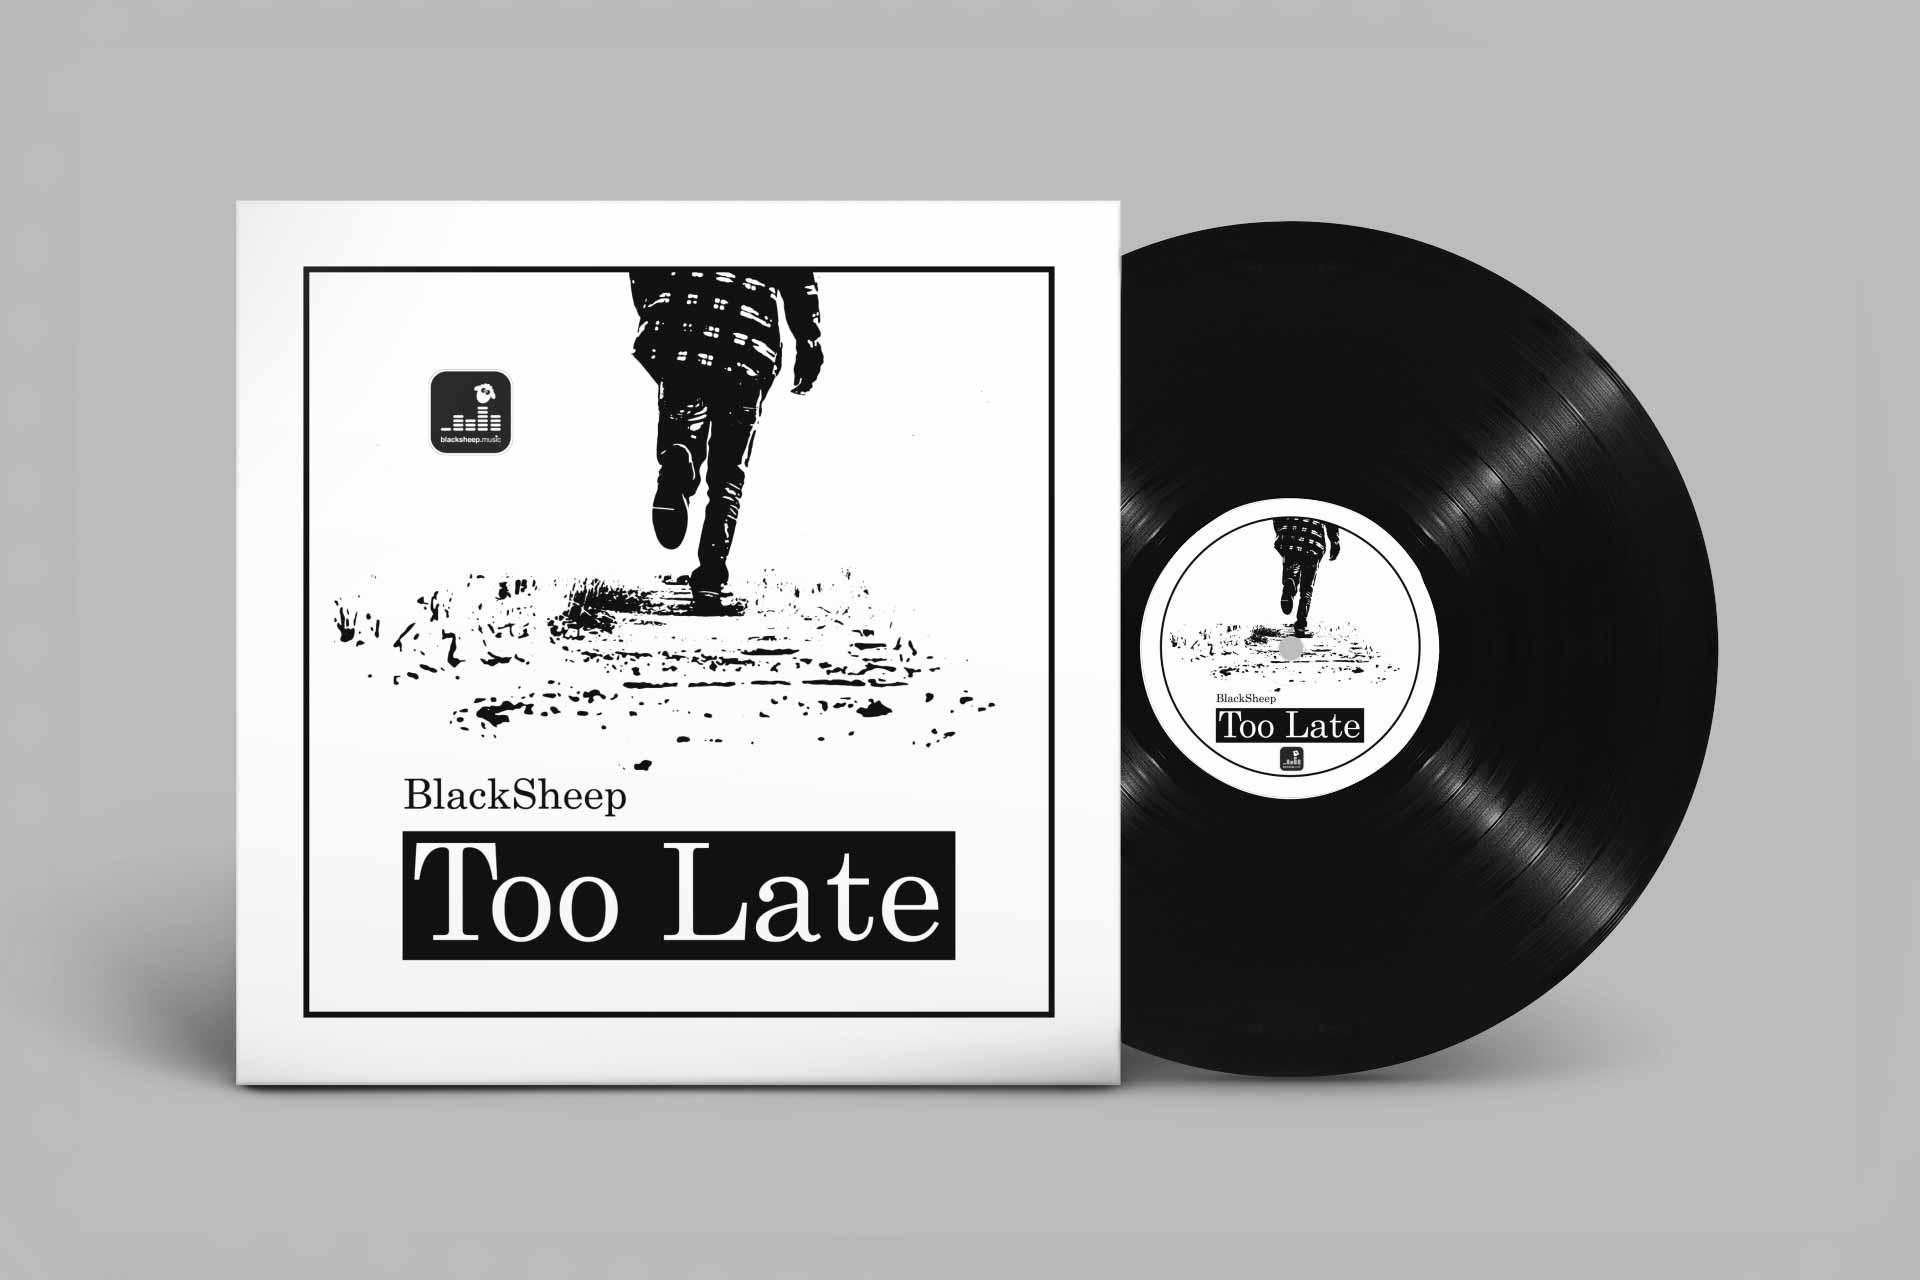 BlackSheep - Too Late